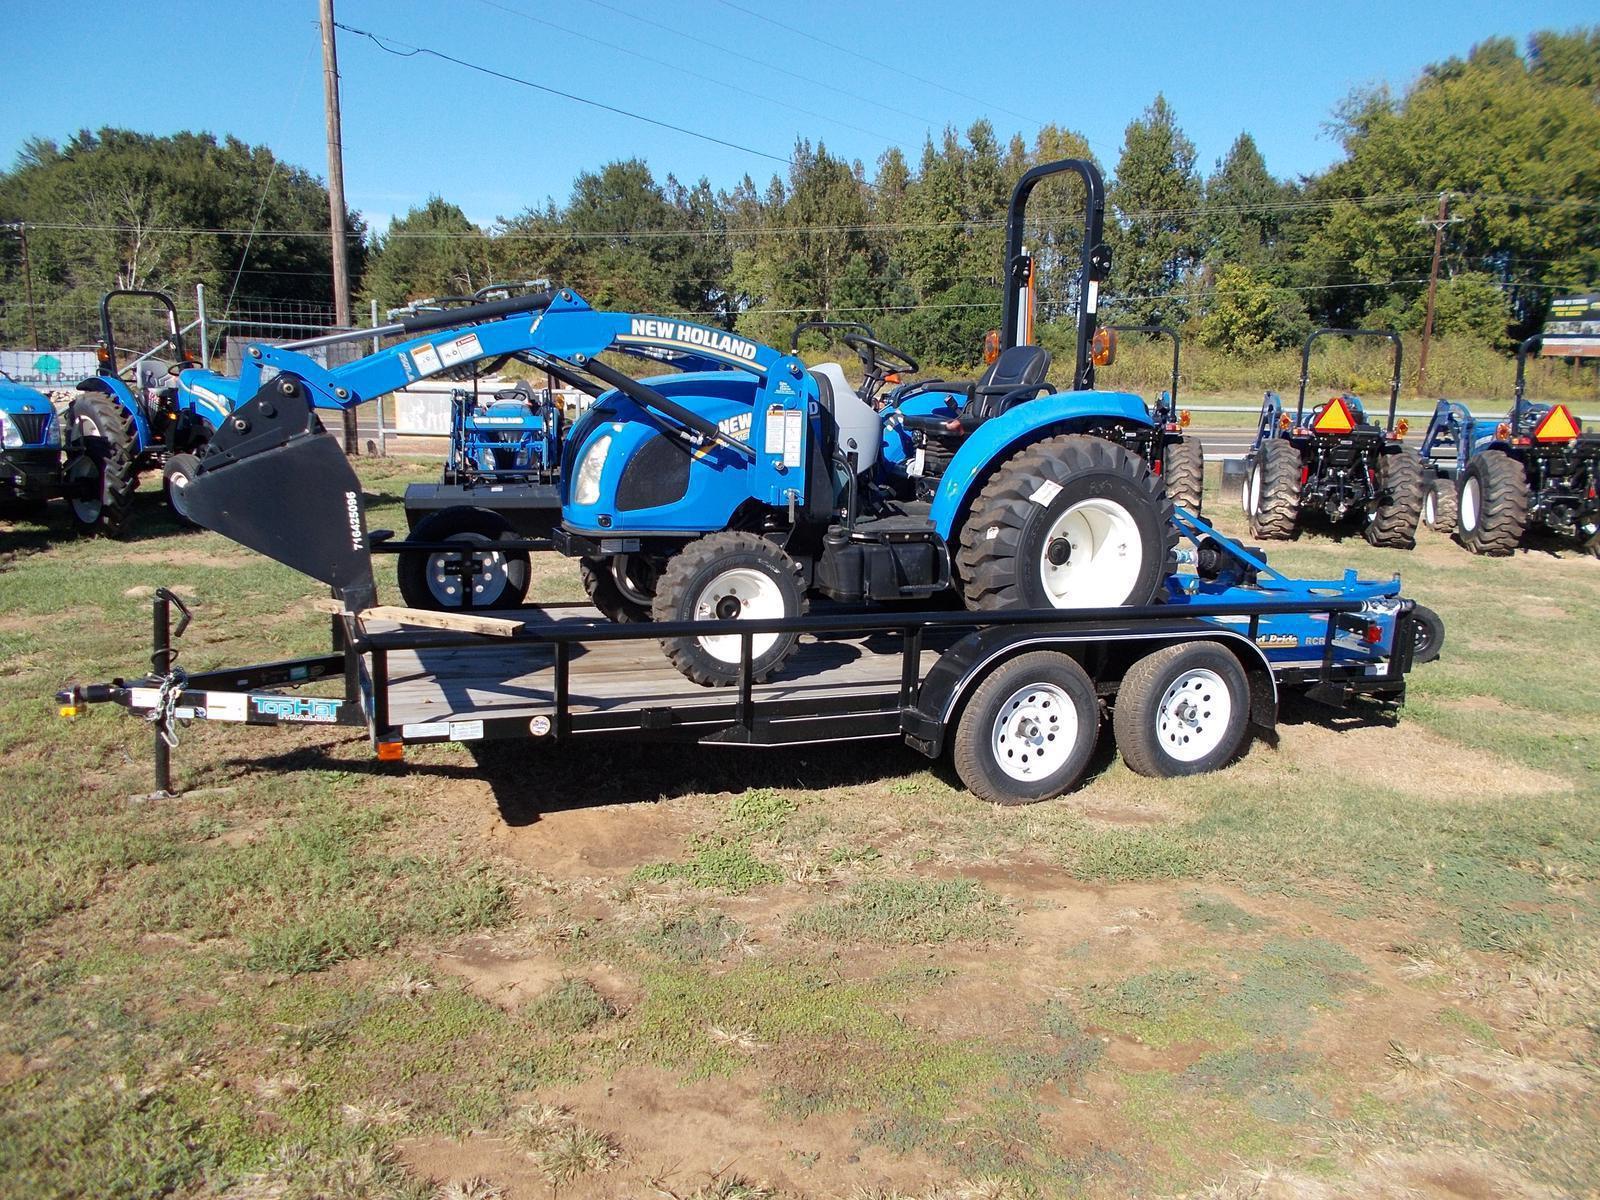 tractors pin farm autonomous holland new tractor front my garden of